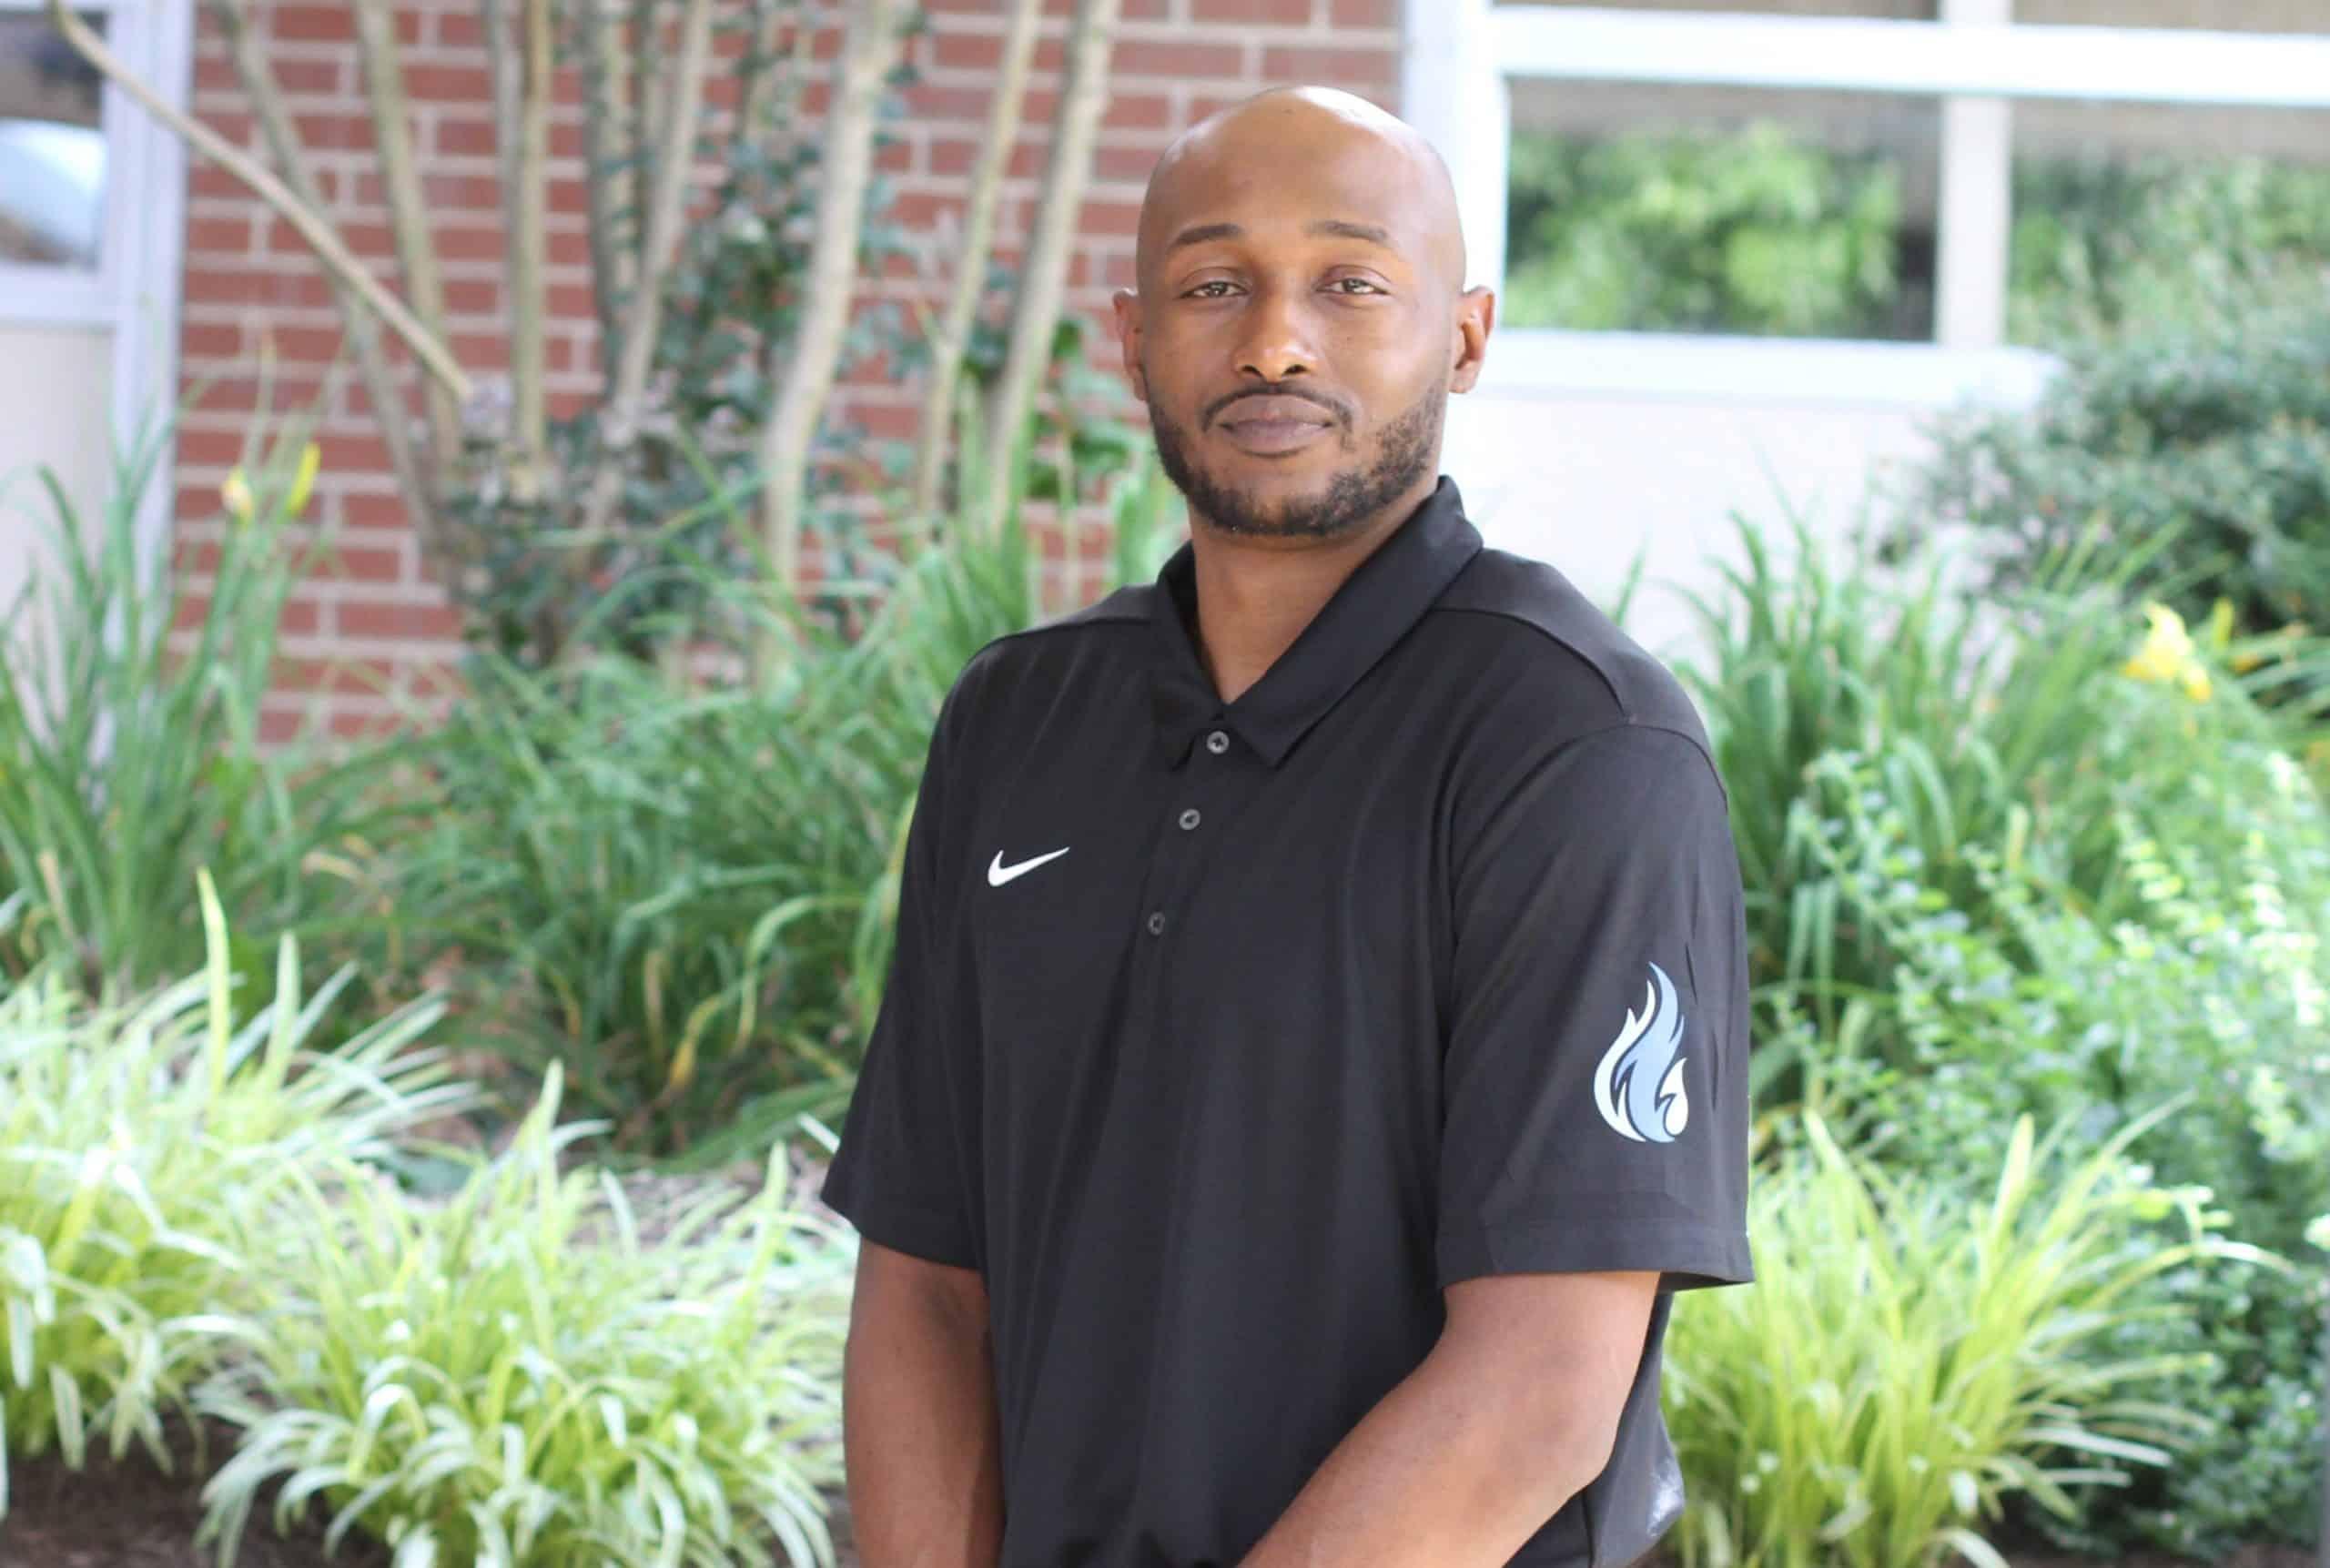 Eli Crawford, boys varsity basketball coach